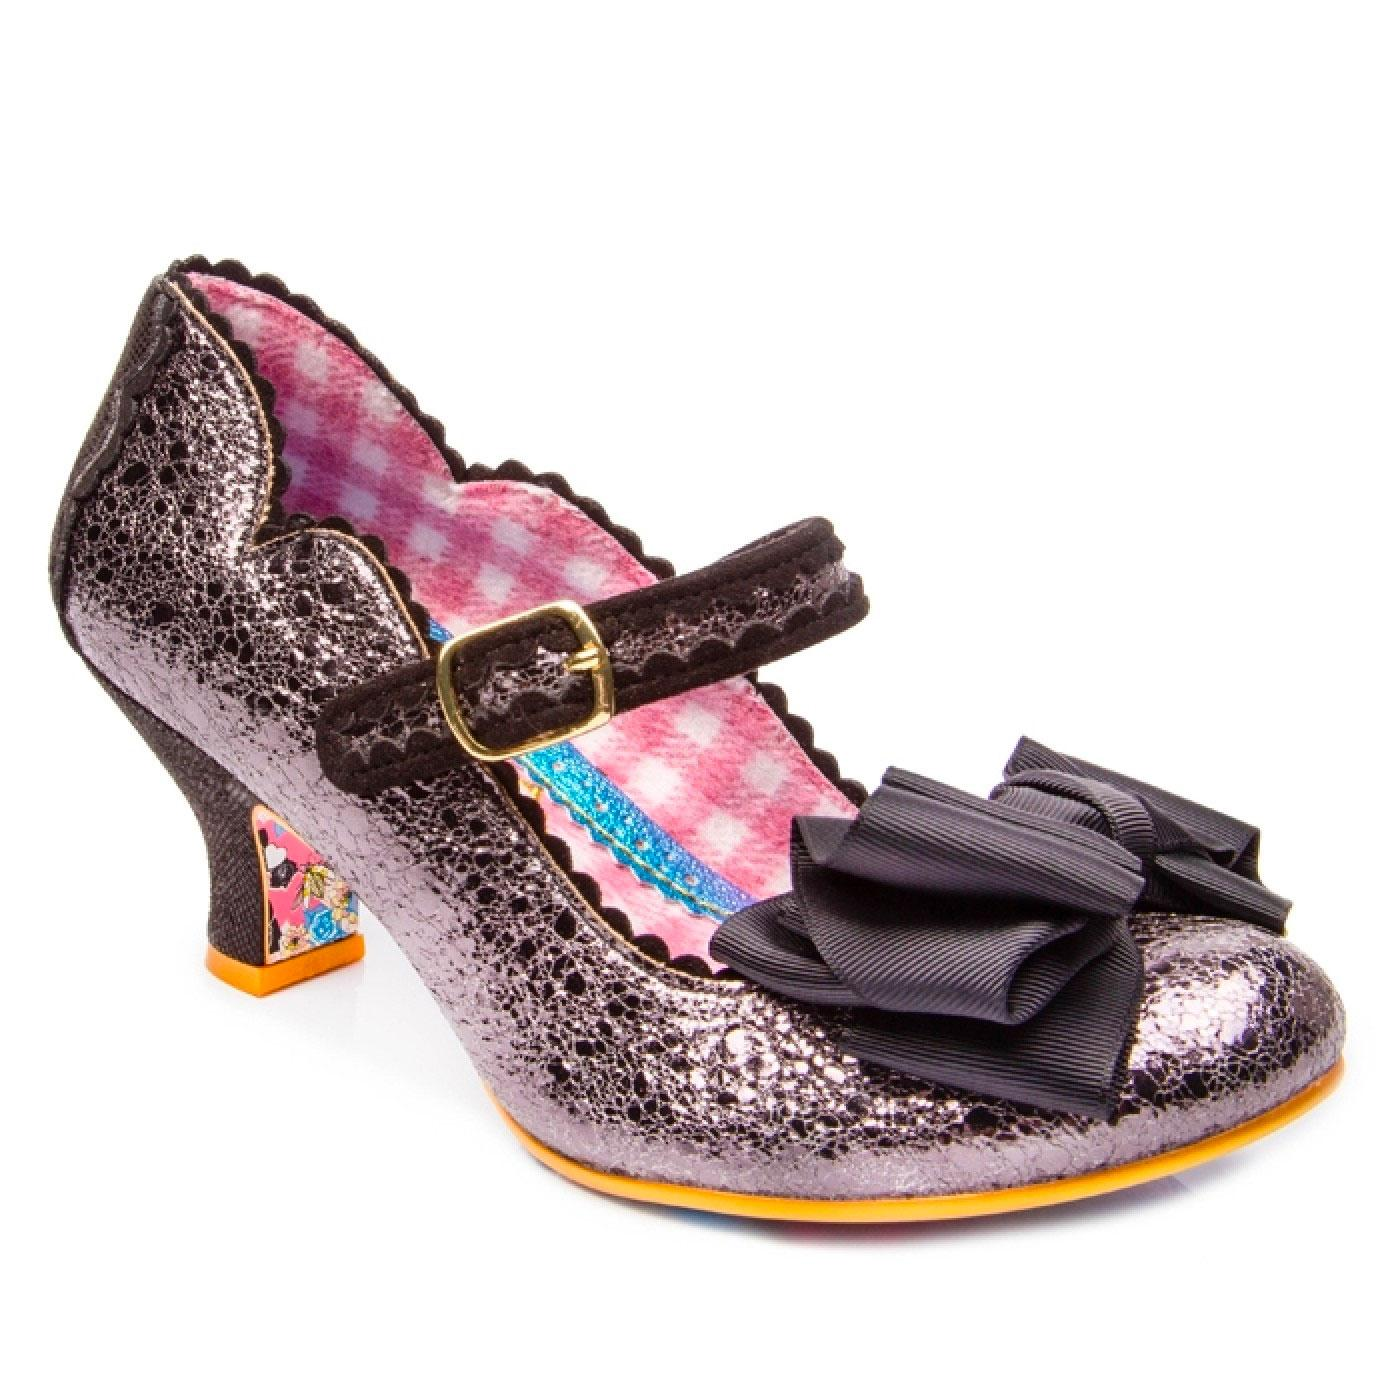 Summer Breeze IRREGULAR CHOICE Silver Party Shoes